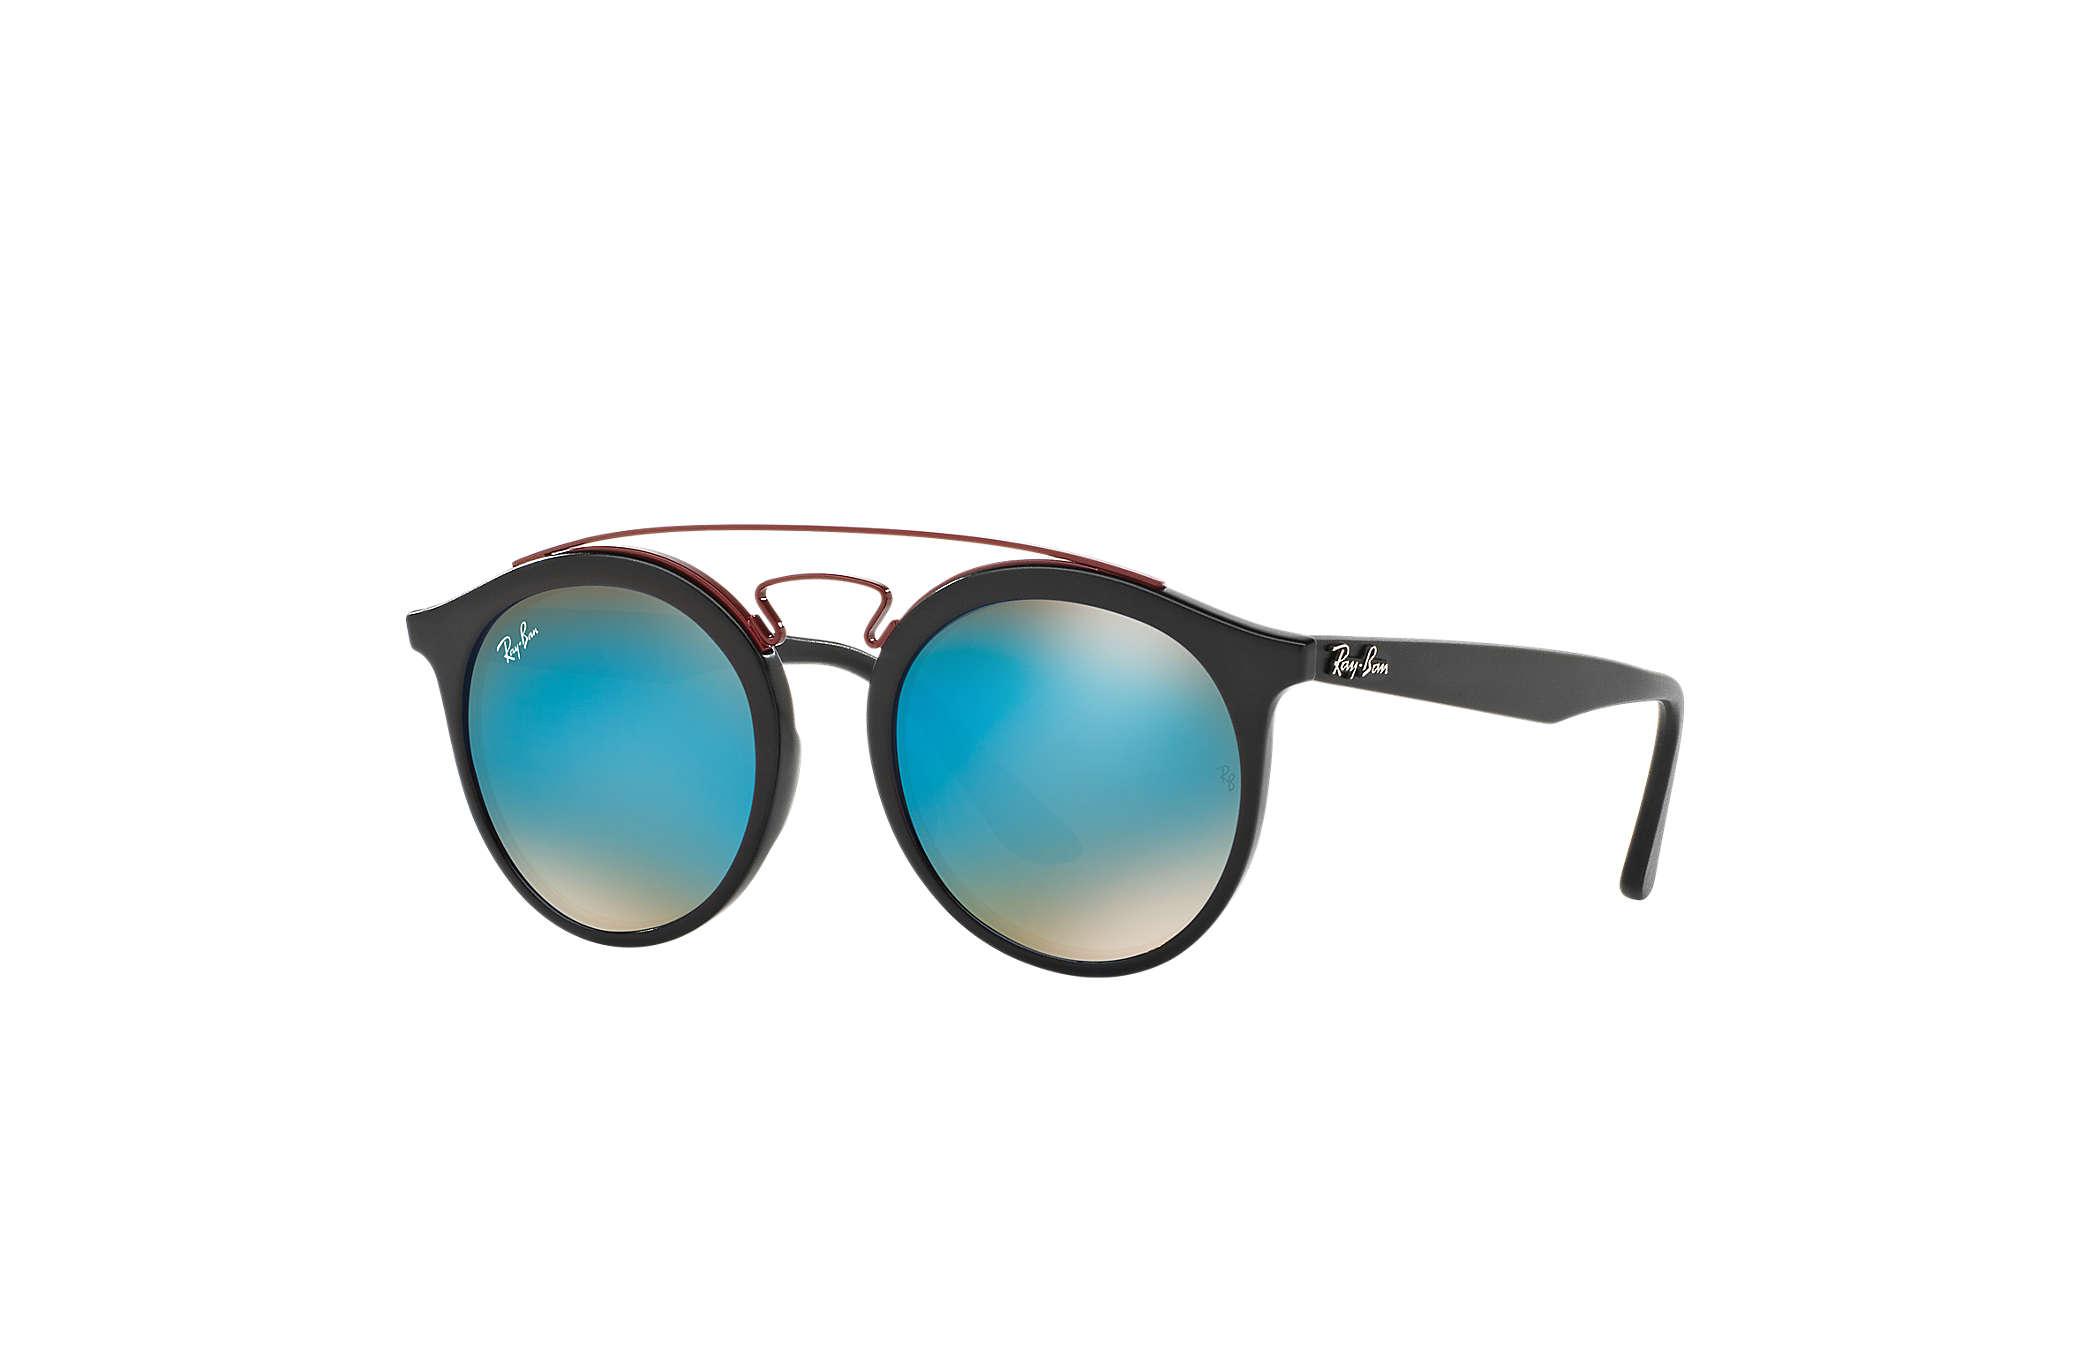 e7edf62add Ray-Ban Rb4256 Gatsby I RB4256 Black - Propionate - Blue Lenses ...